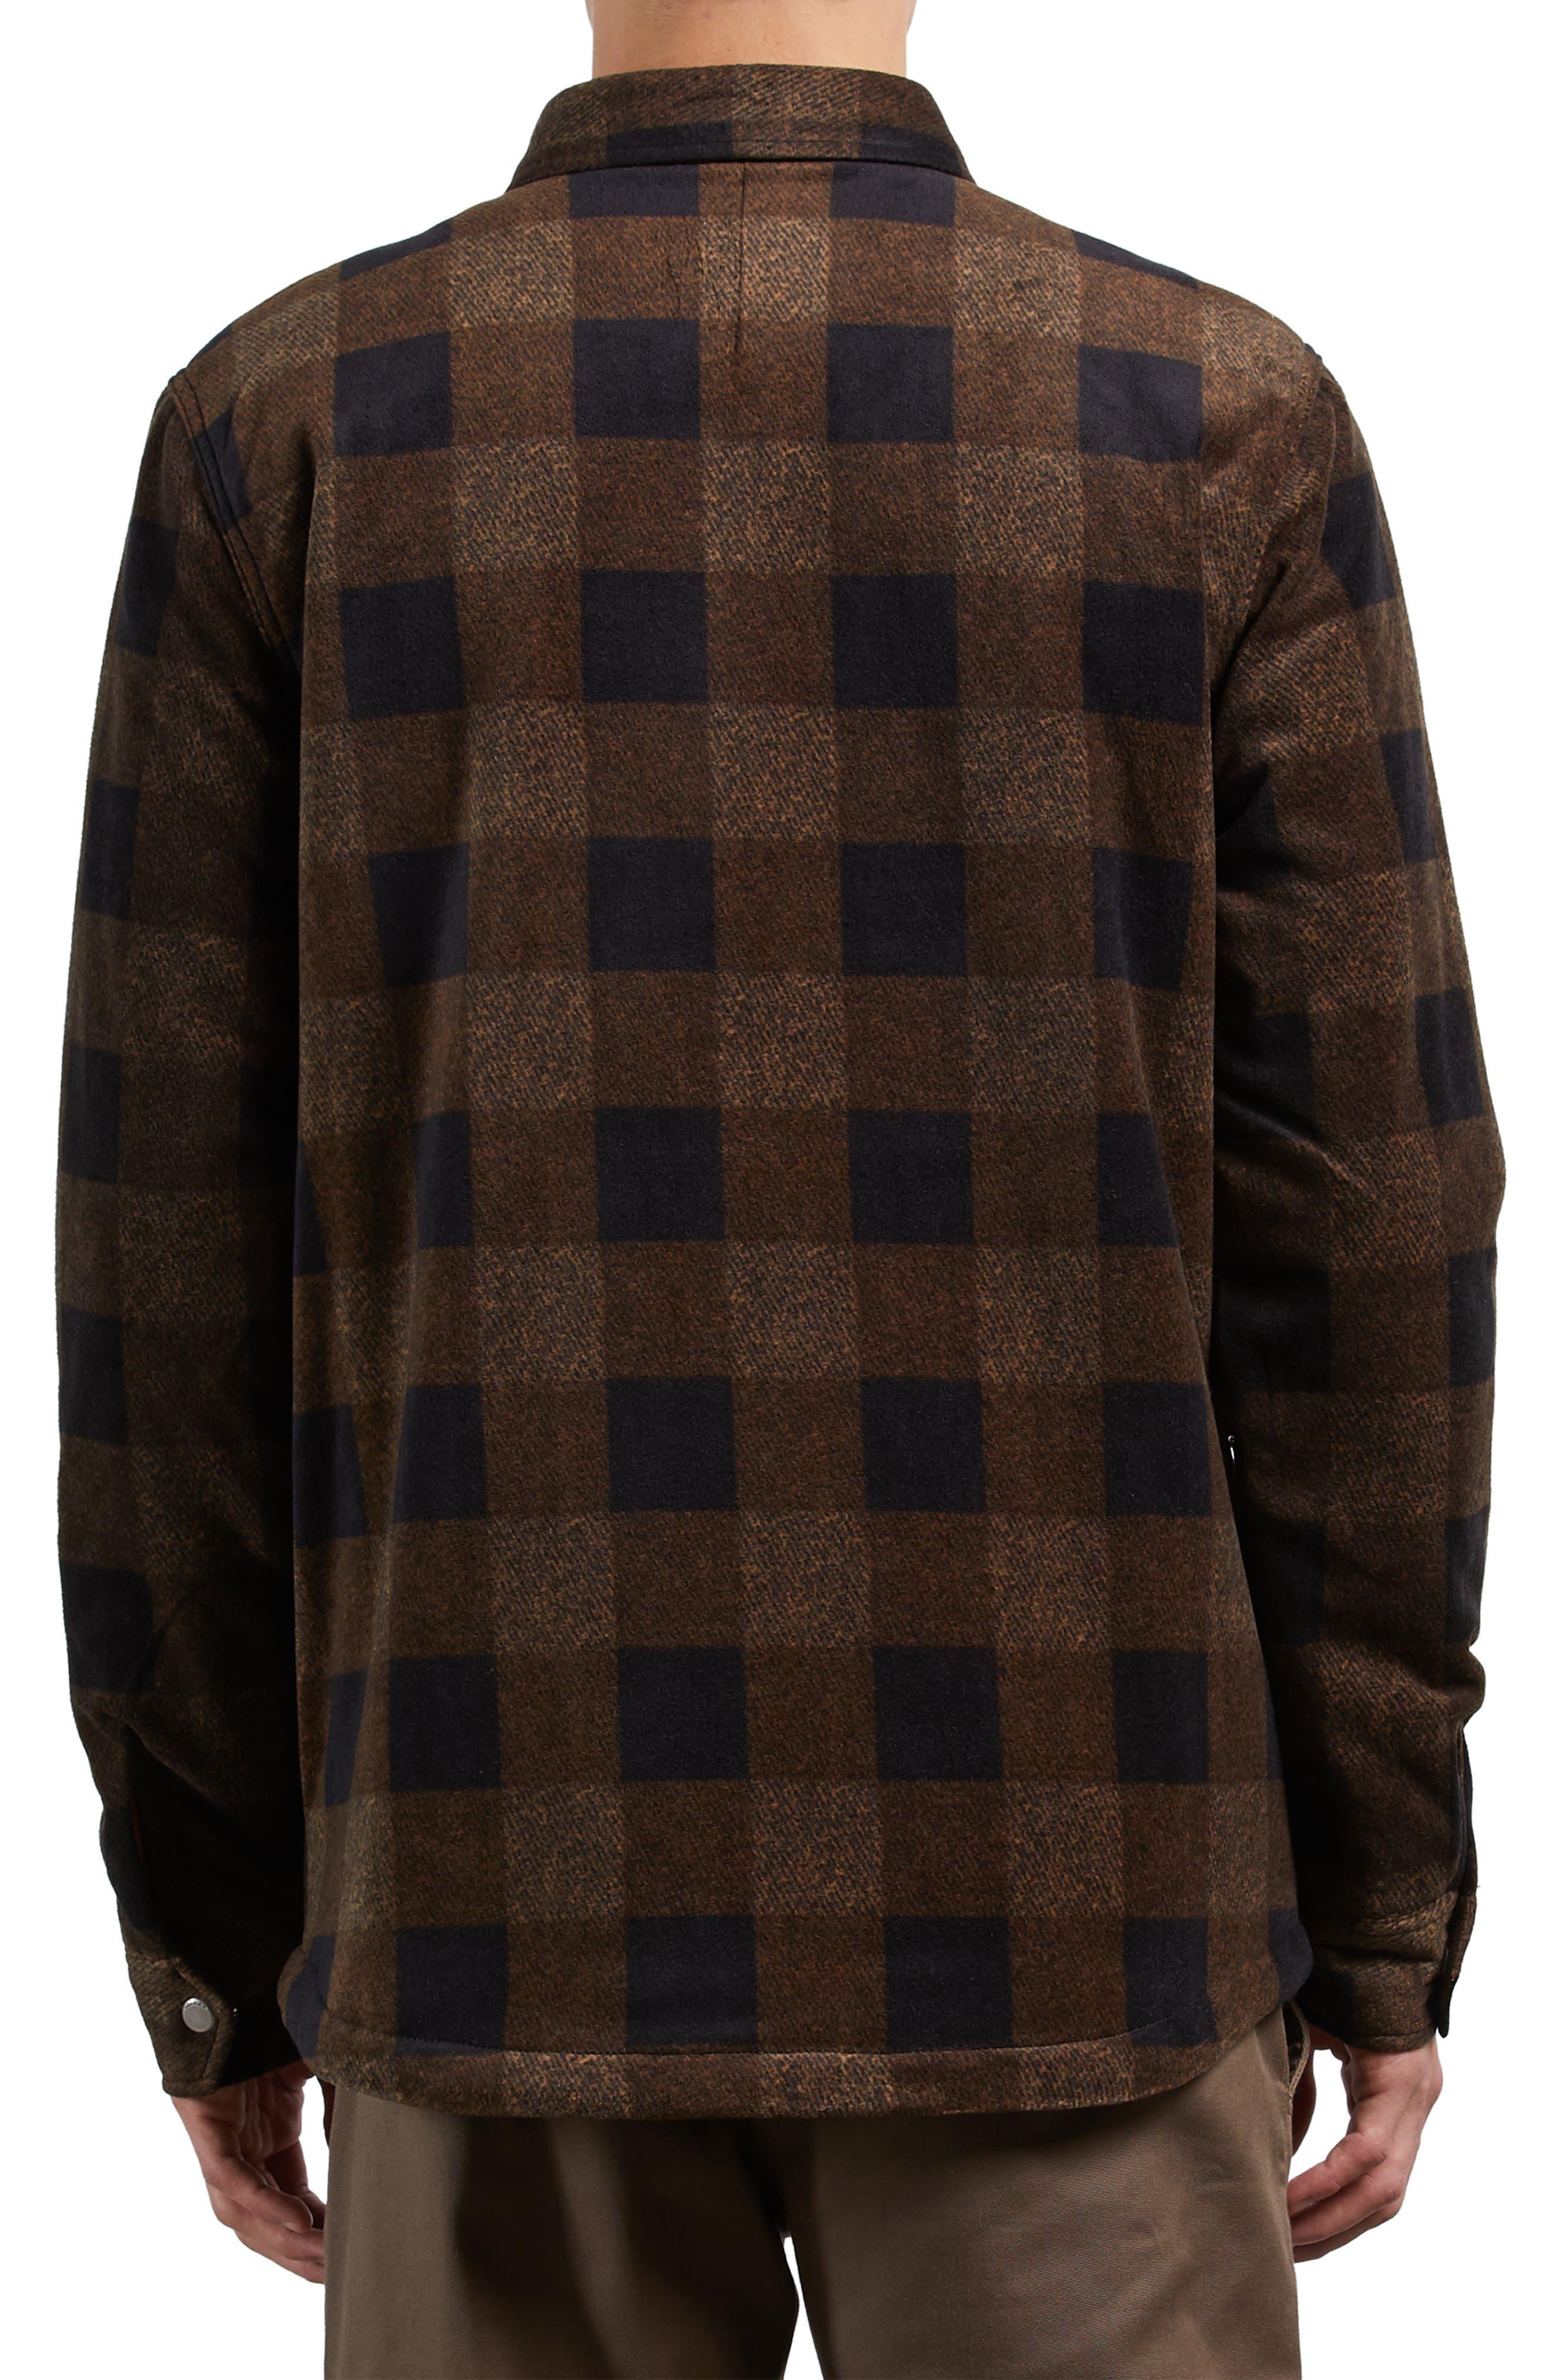 Bower Check Print Fleece Jacket,                             Alternate thumbnail 2, color,                             800